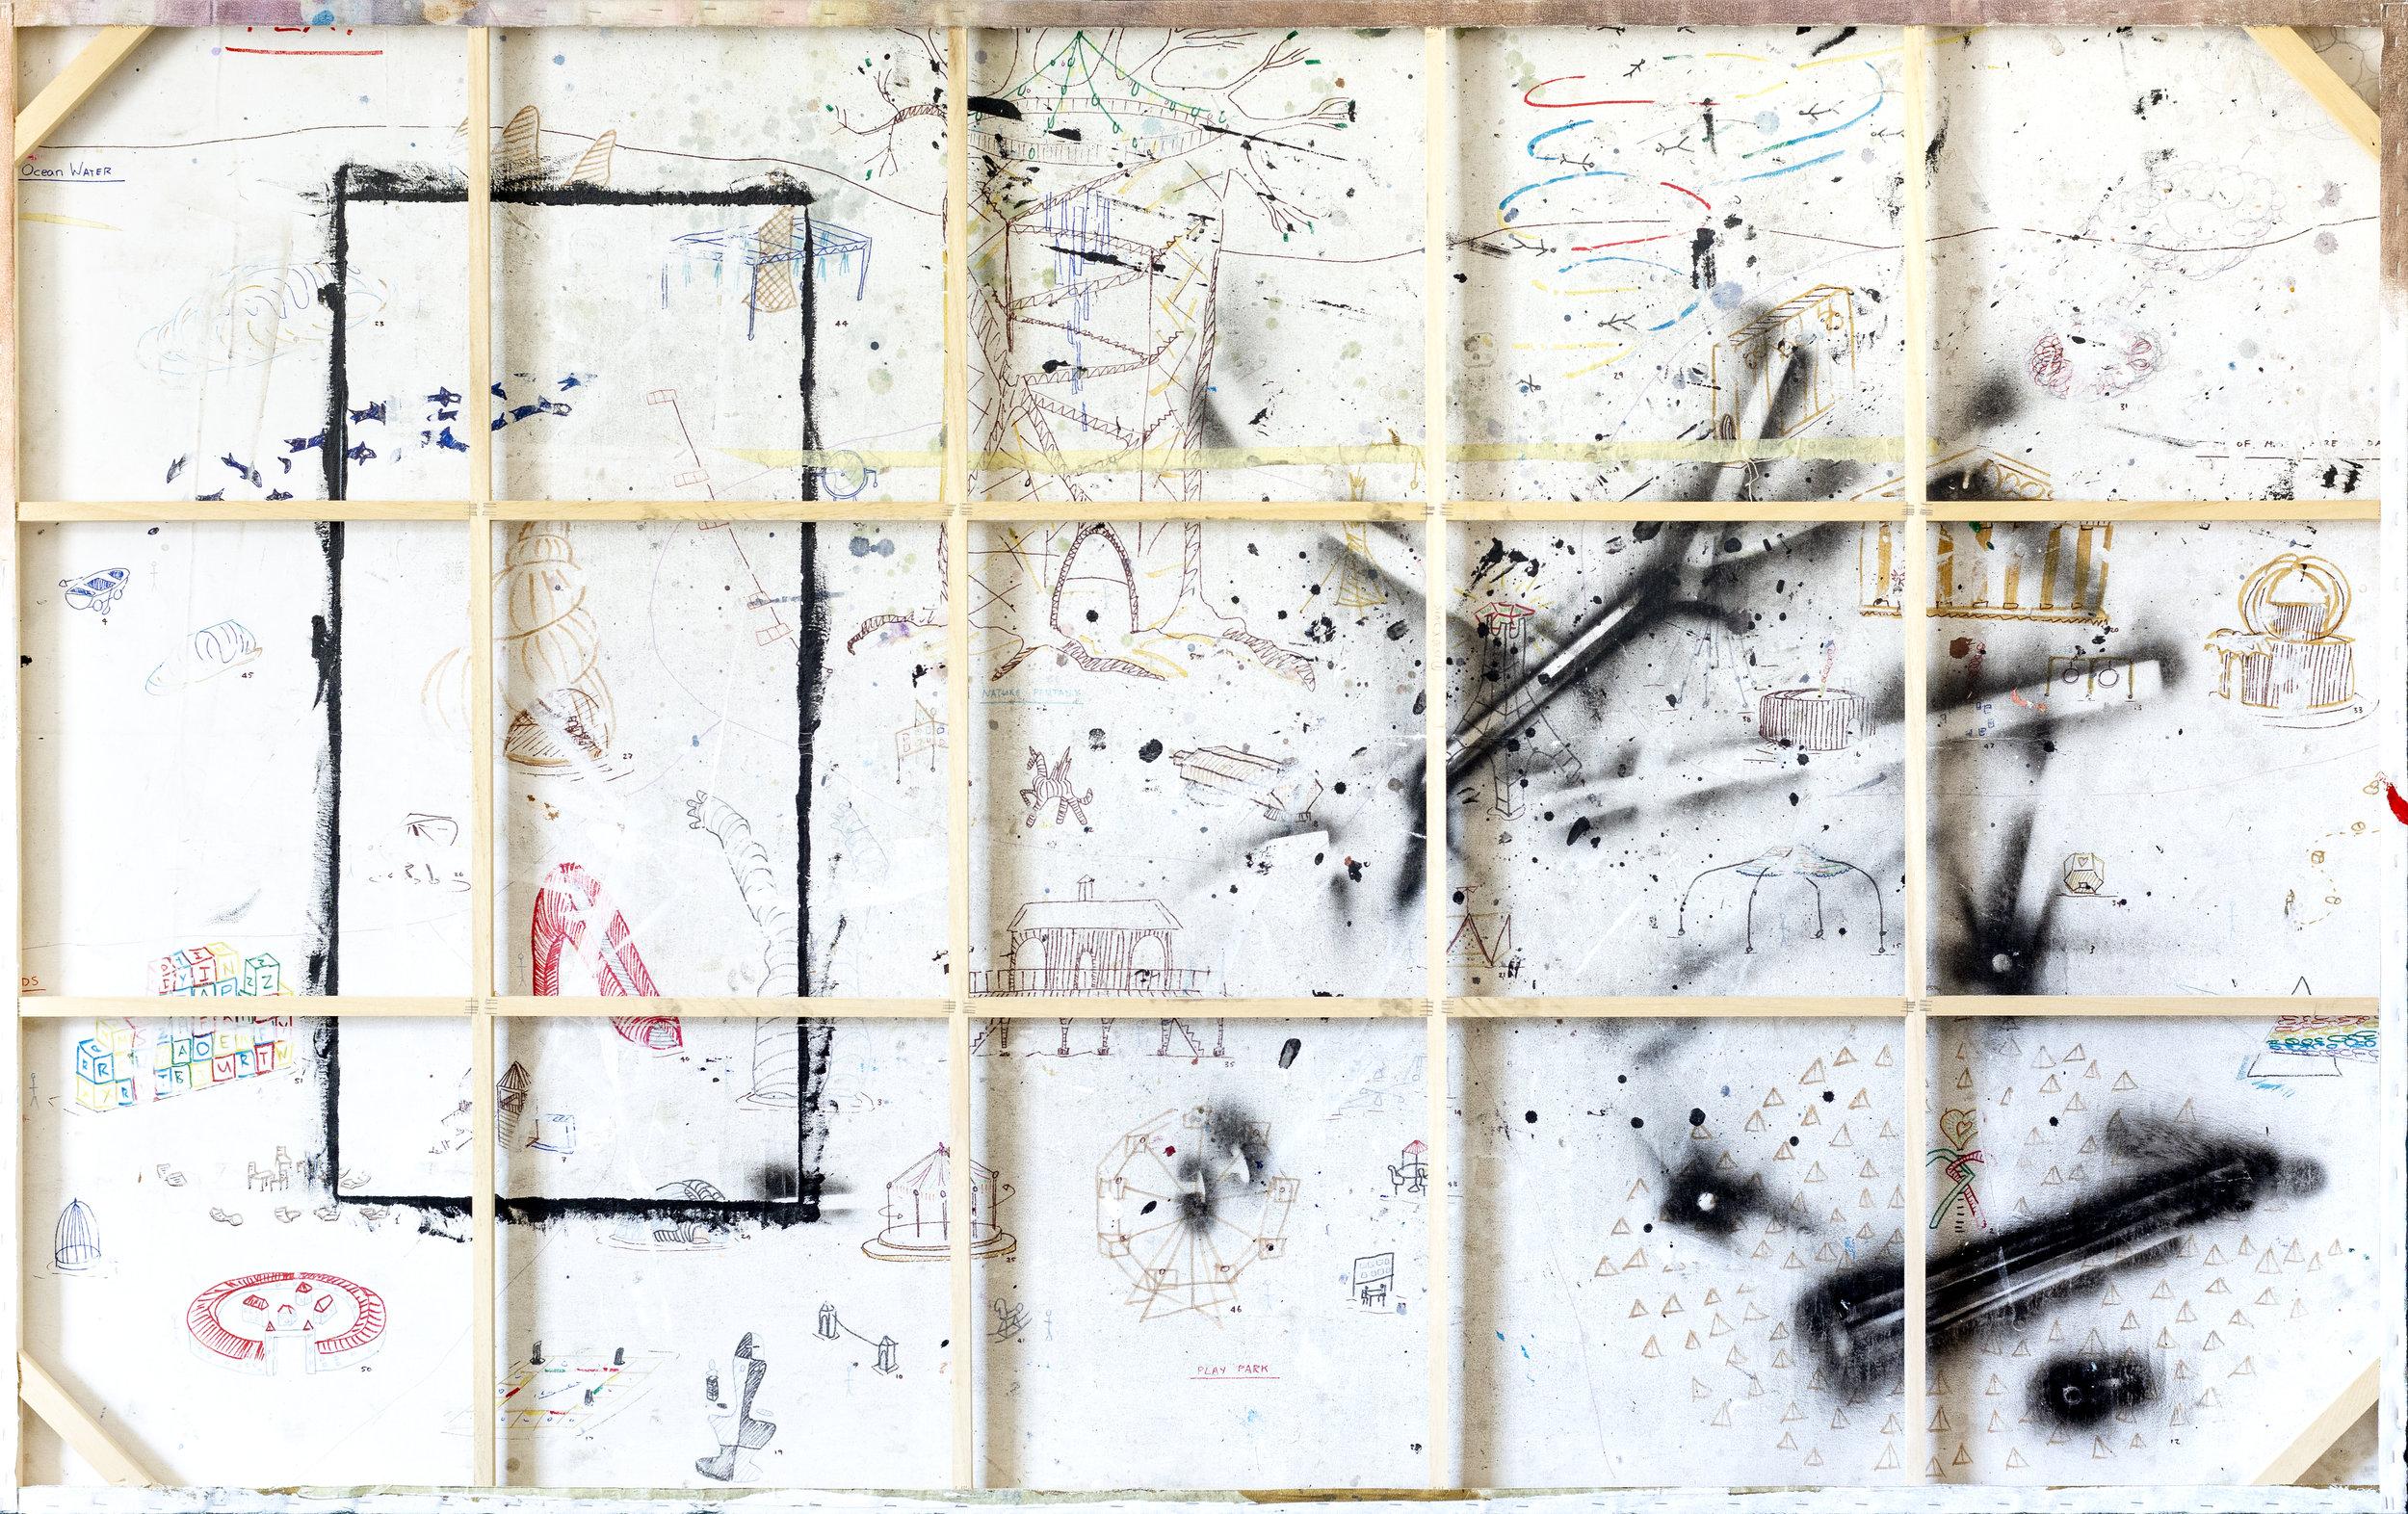 Suburban Park Ruffians (back of canvas), 2019, 240cm x 150cm